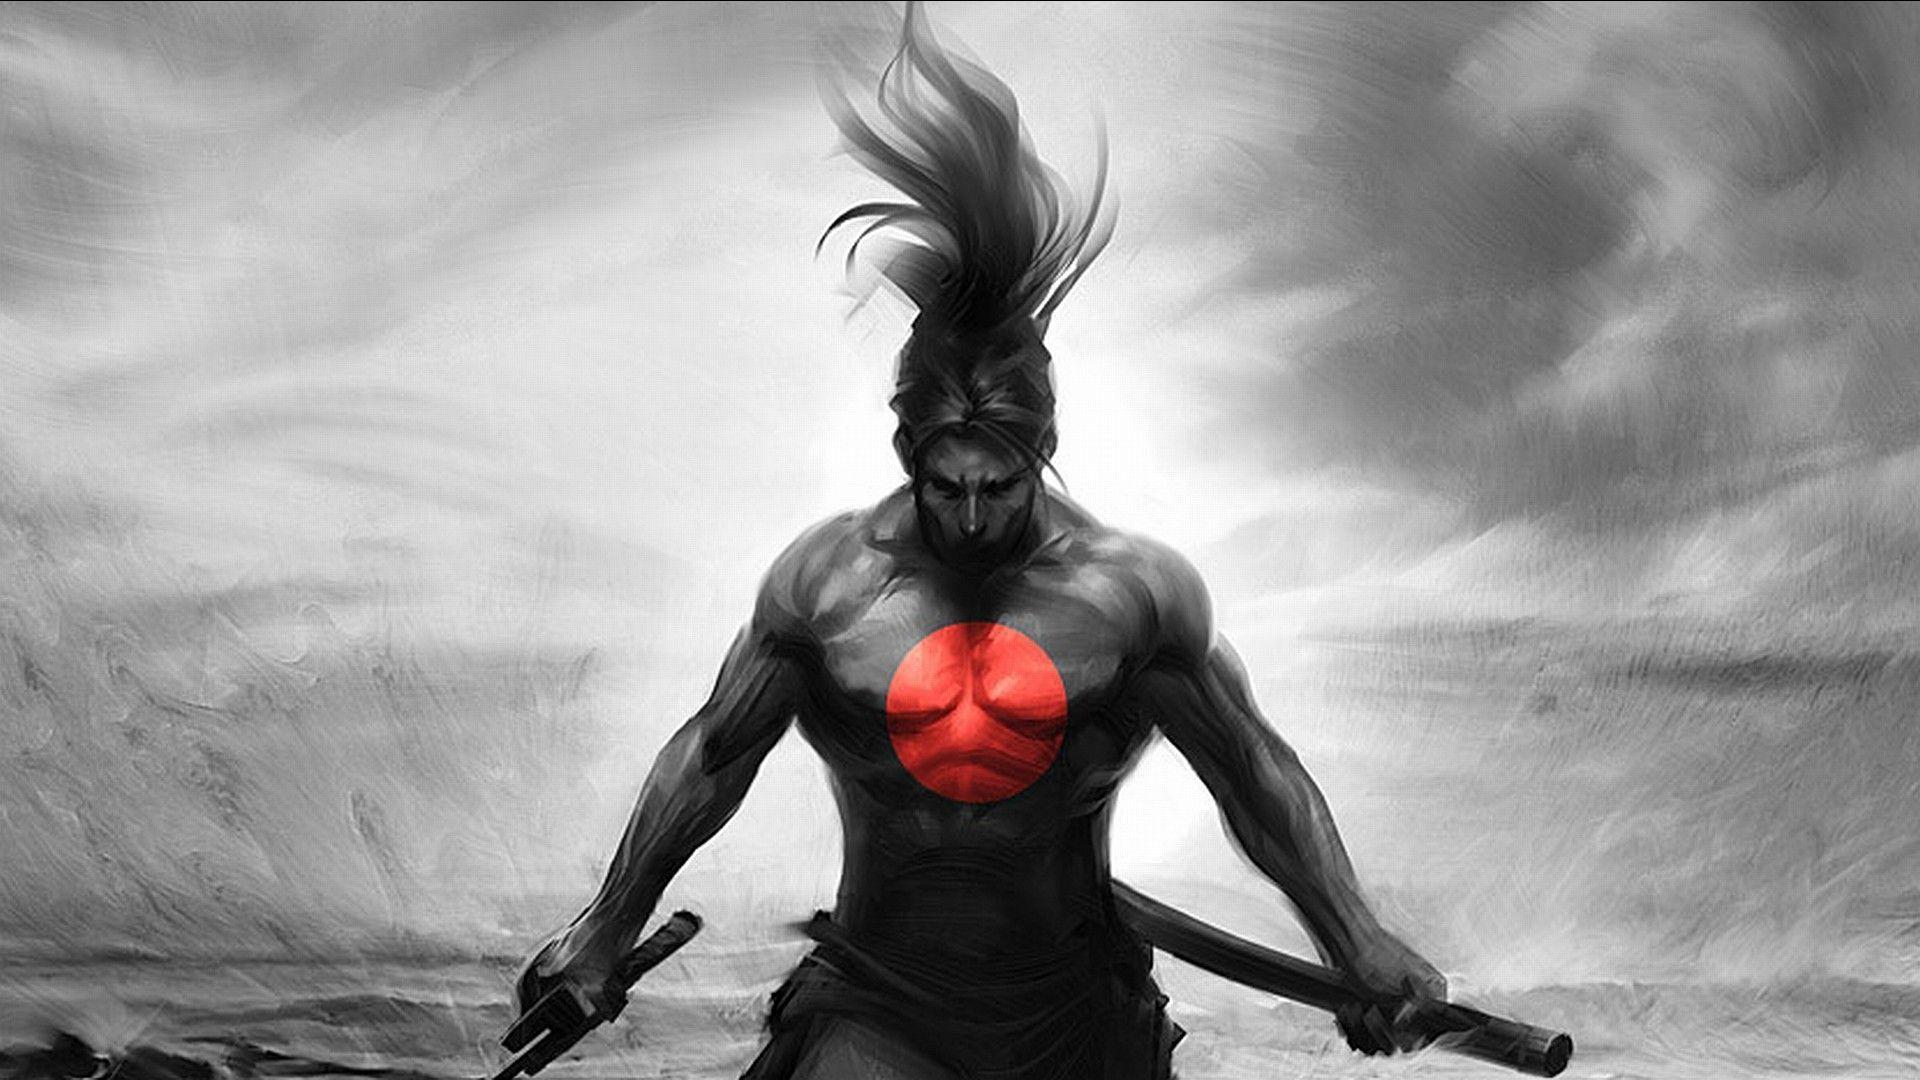 4k Samurai Fights Wallpapers Top Free 4k Samurai Fights Backgrounds Wallpaperaccess